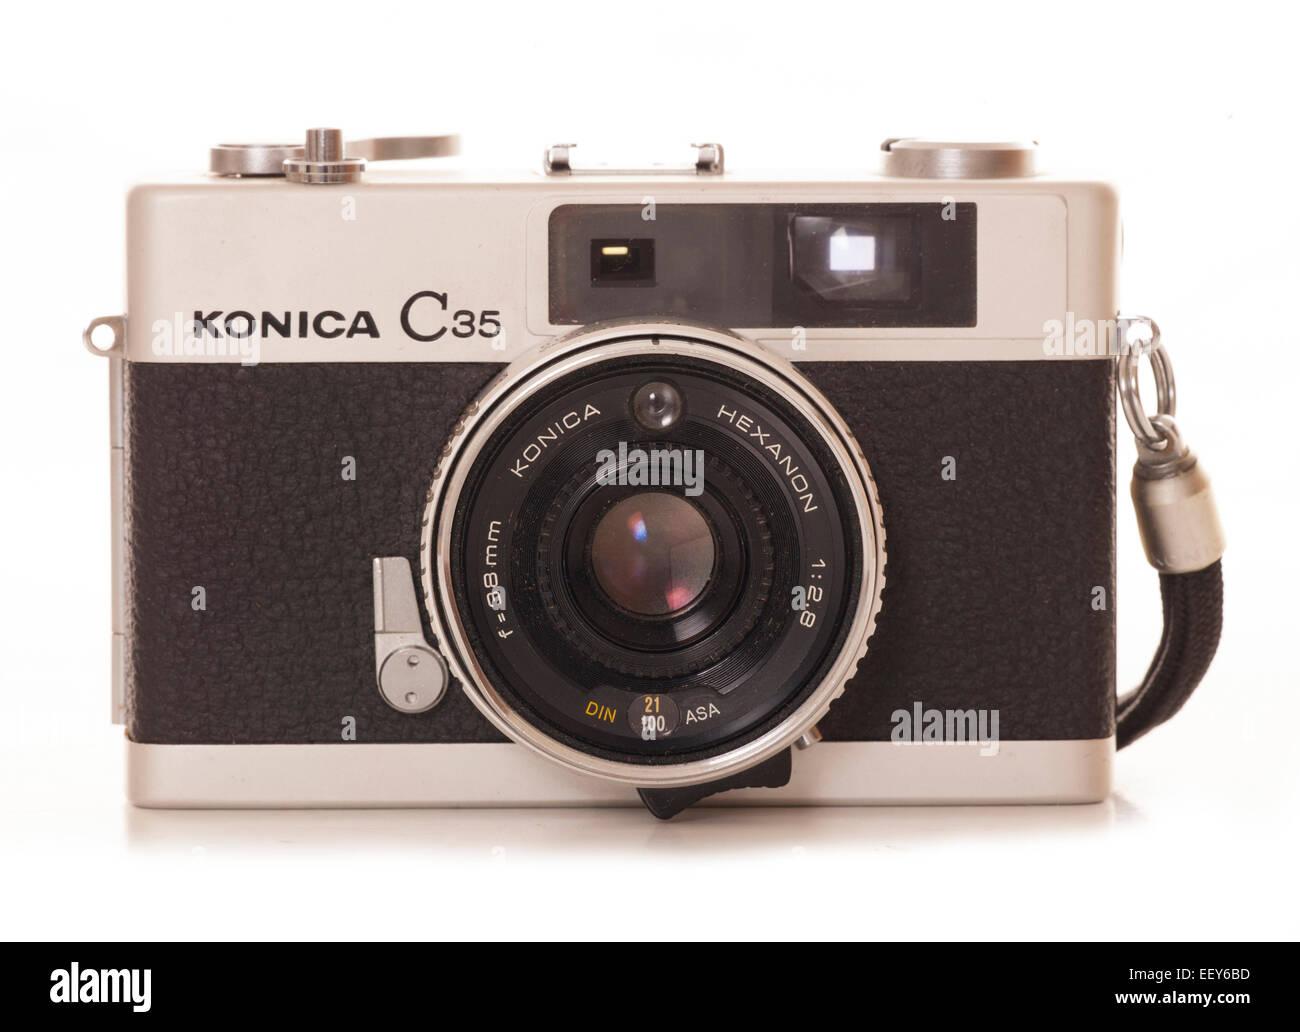 konica c35 camera film camera cutout Stock Photo